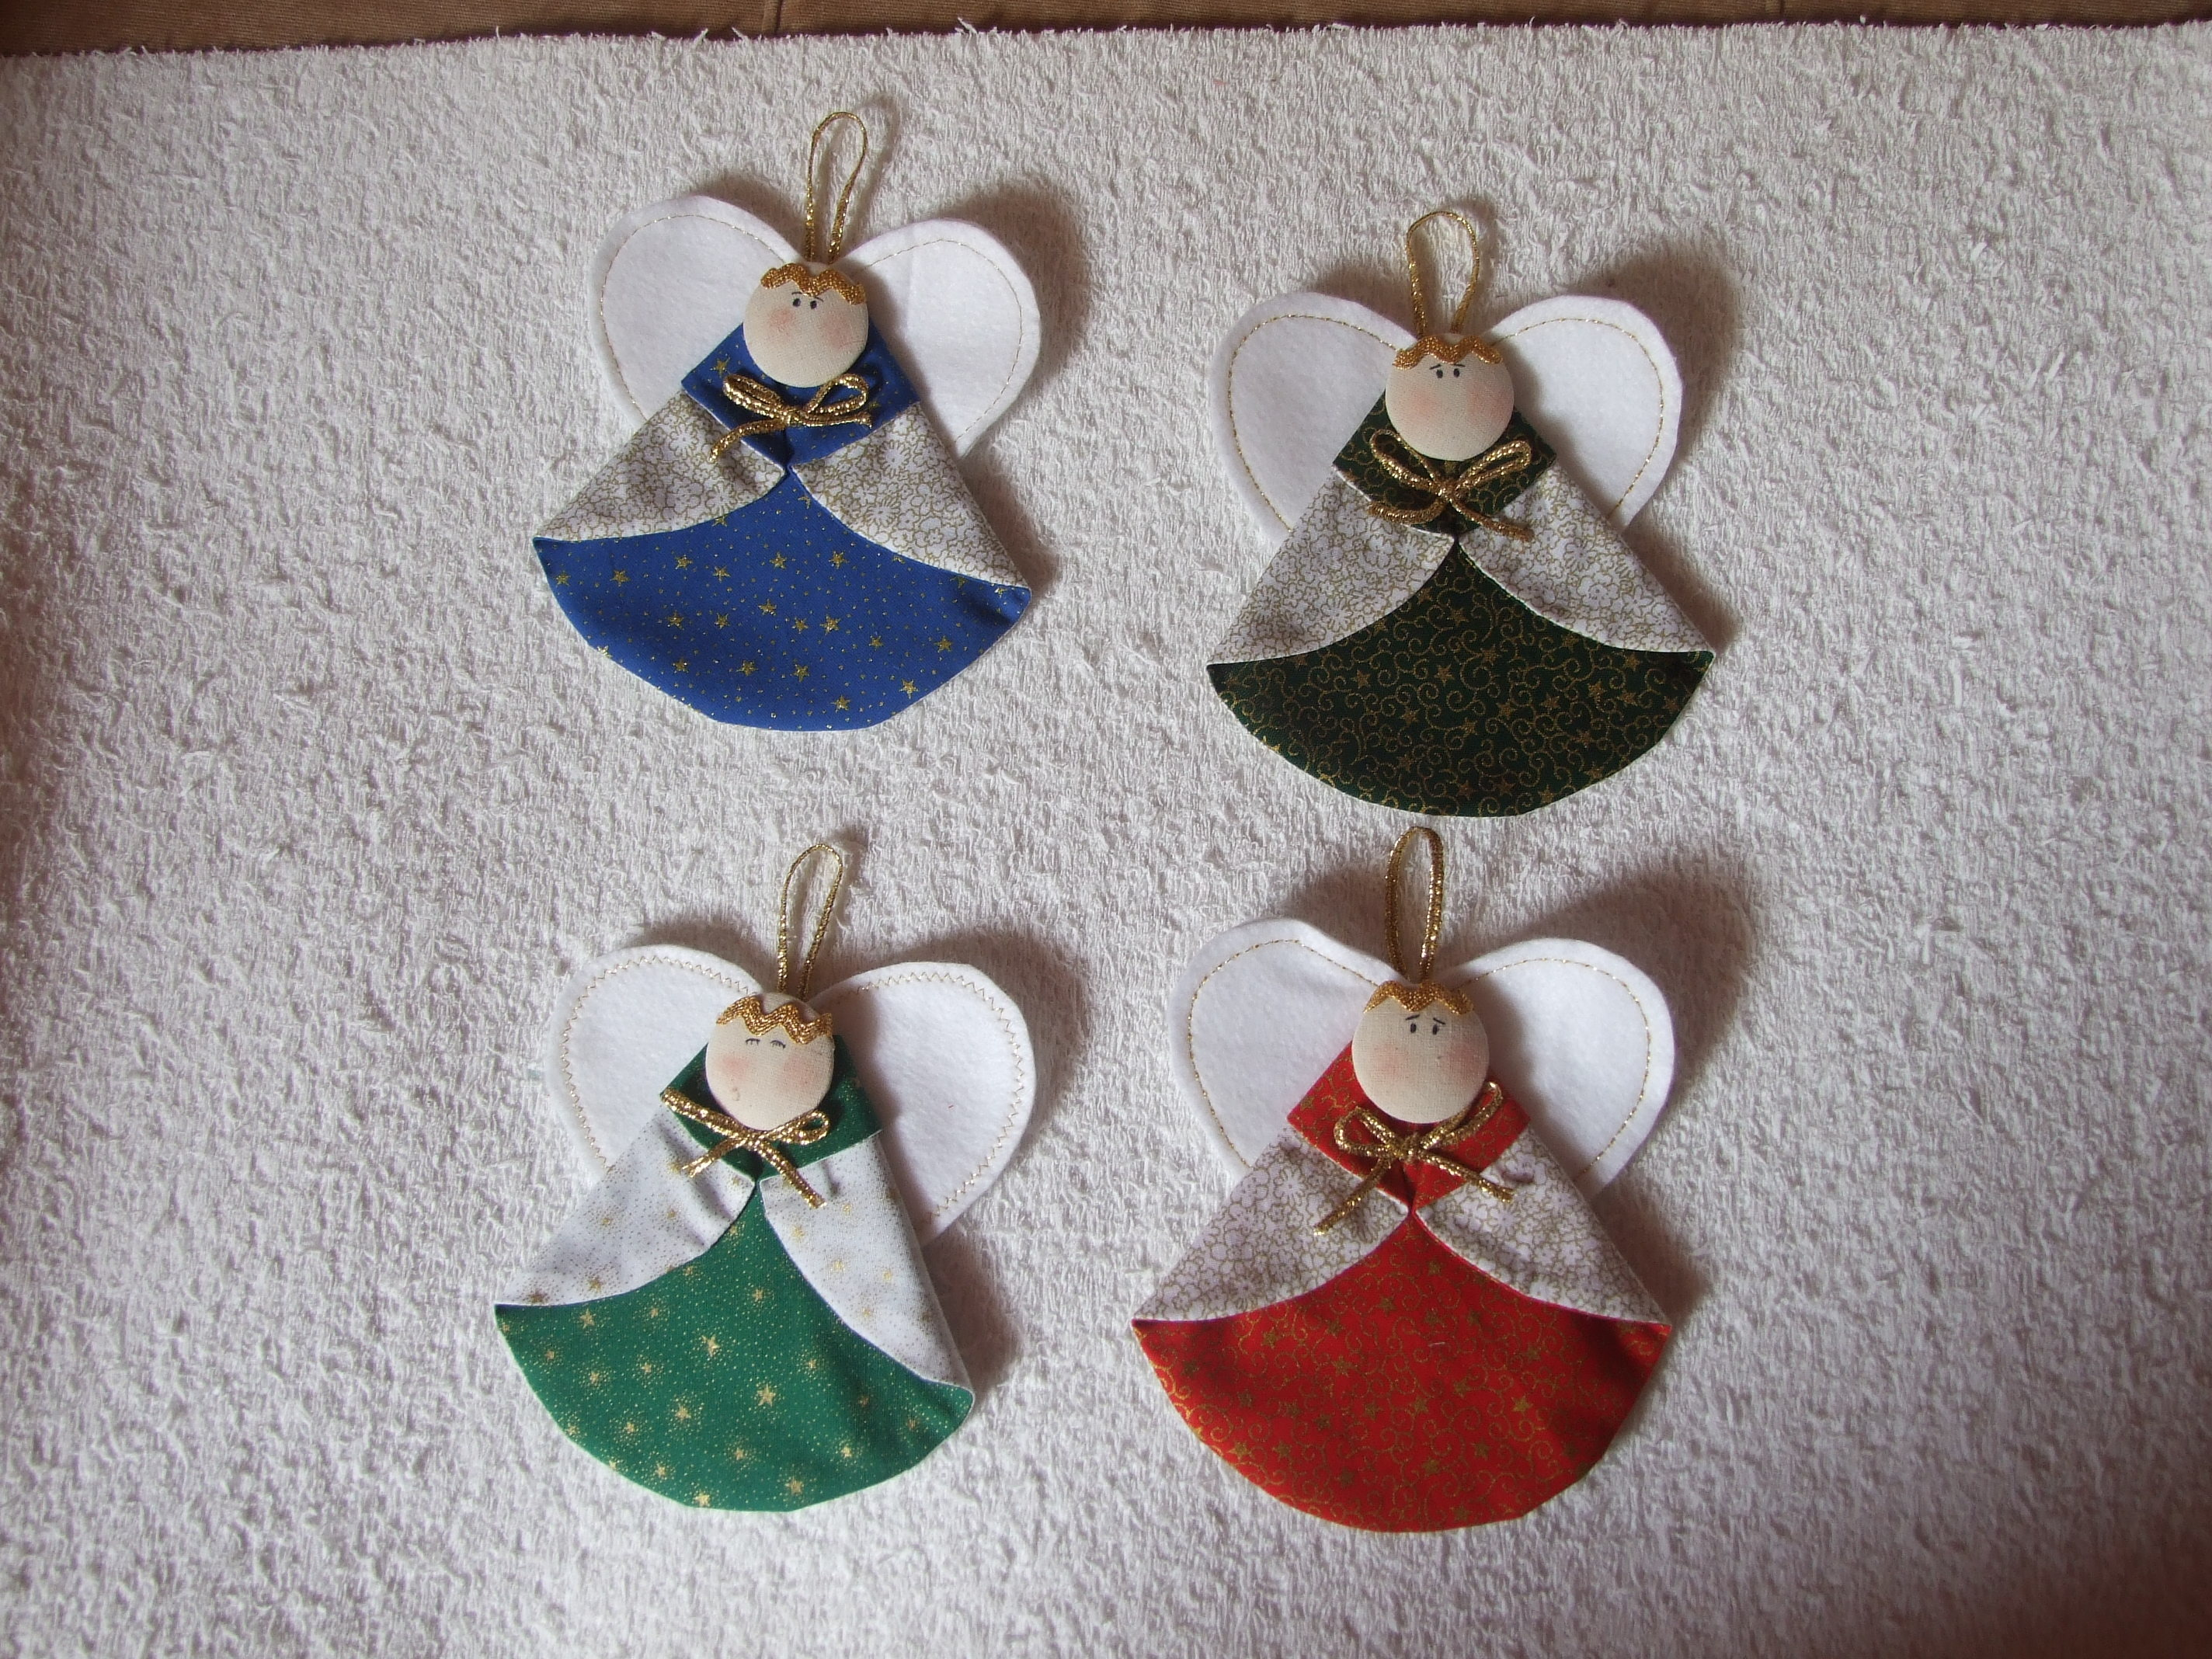 Enfeite De Natal ~ Enfeites para arvore de natal Anjos Arte Belo Elo7